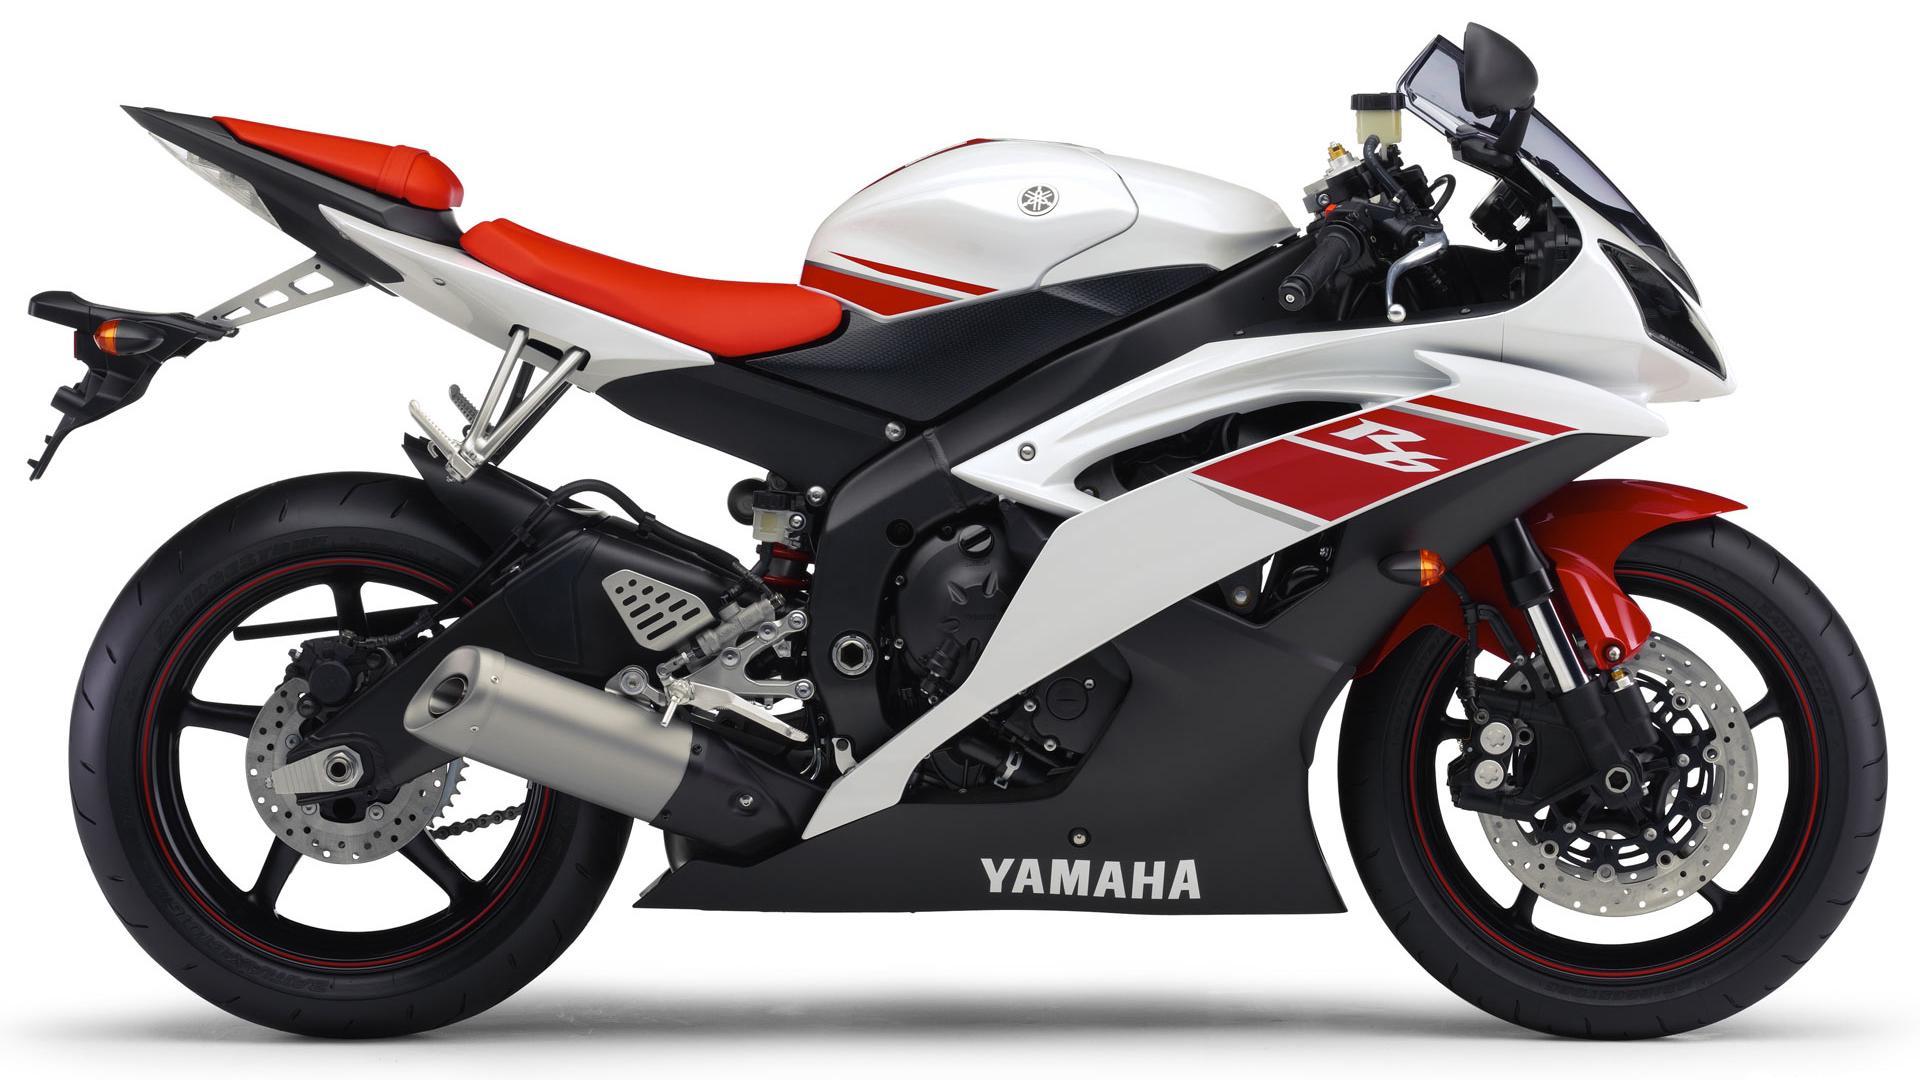 Yamaha R6 Bike 1080p Wallpaper